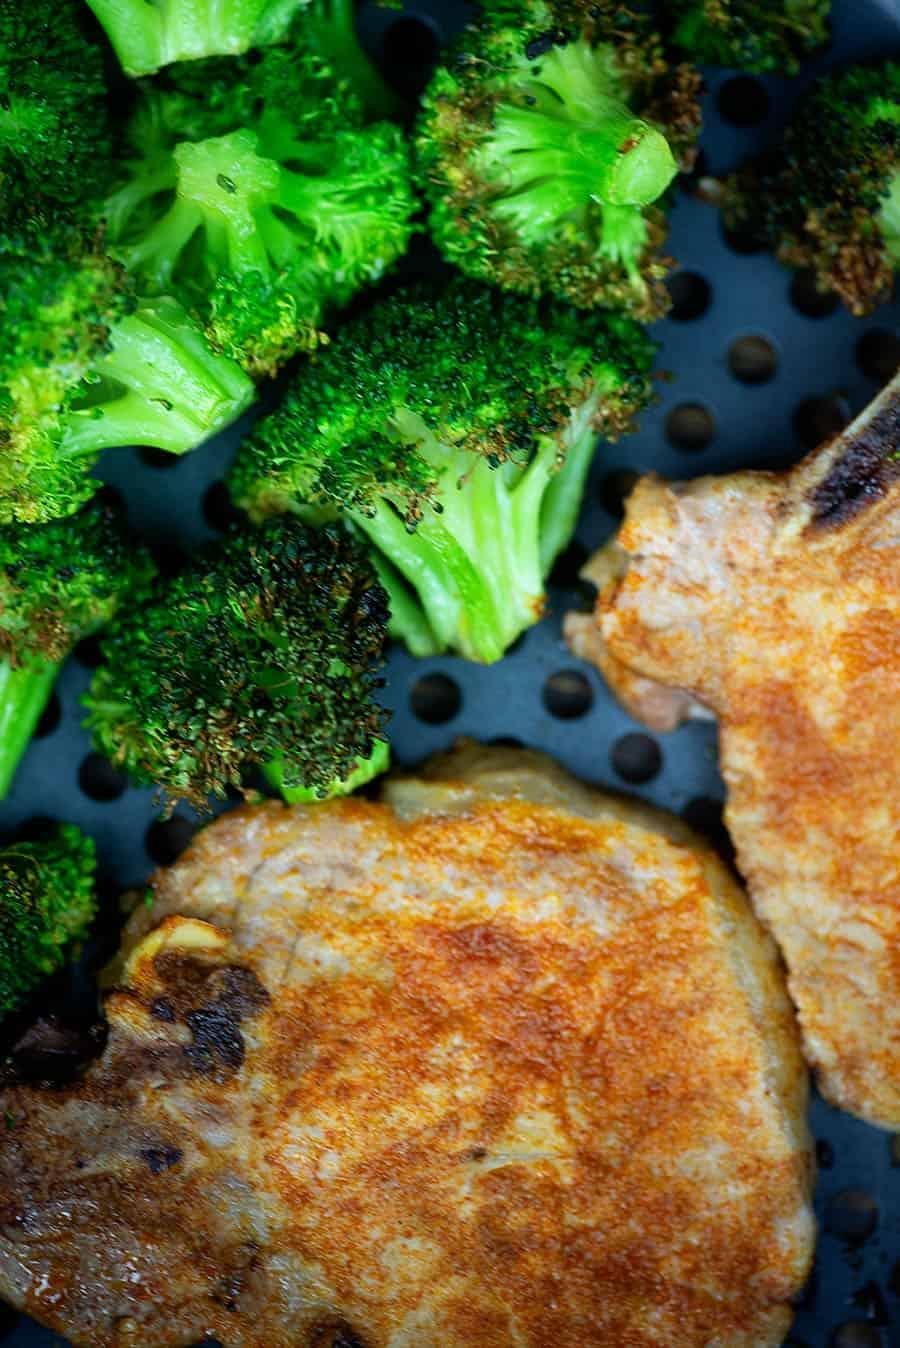 broccoli and pork chops on frying pan